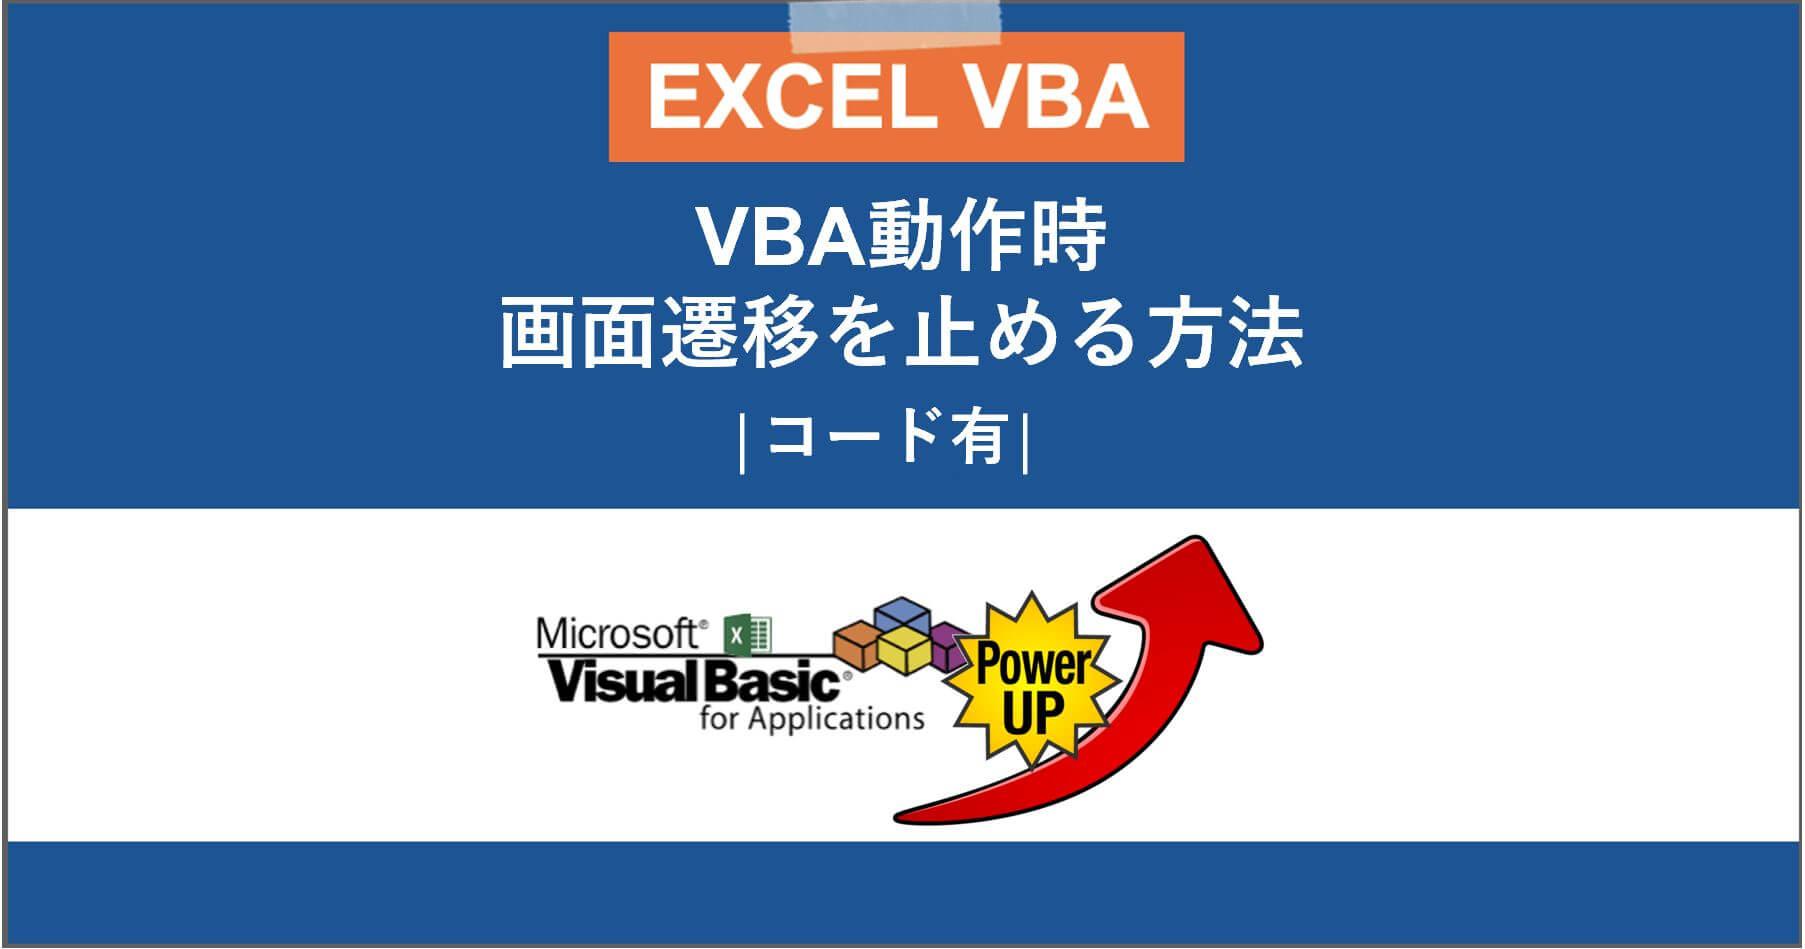 VBA-EXCELの画面遷移を止める方法